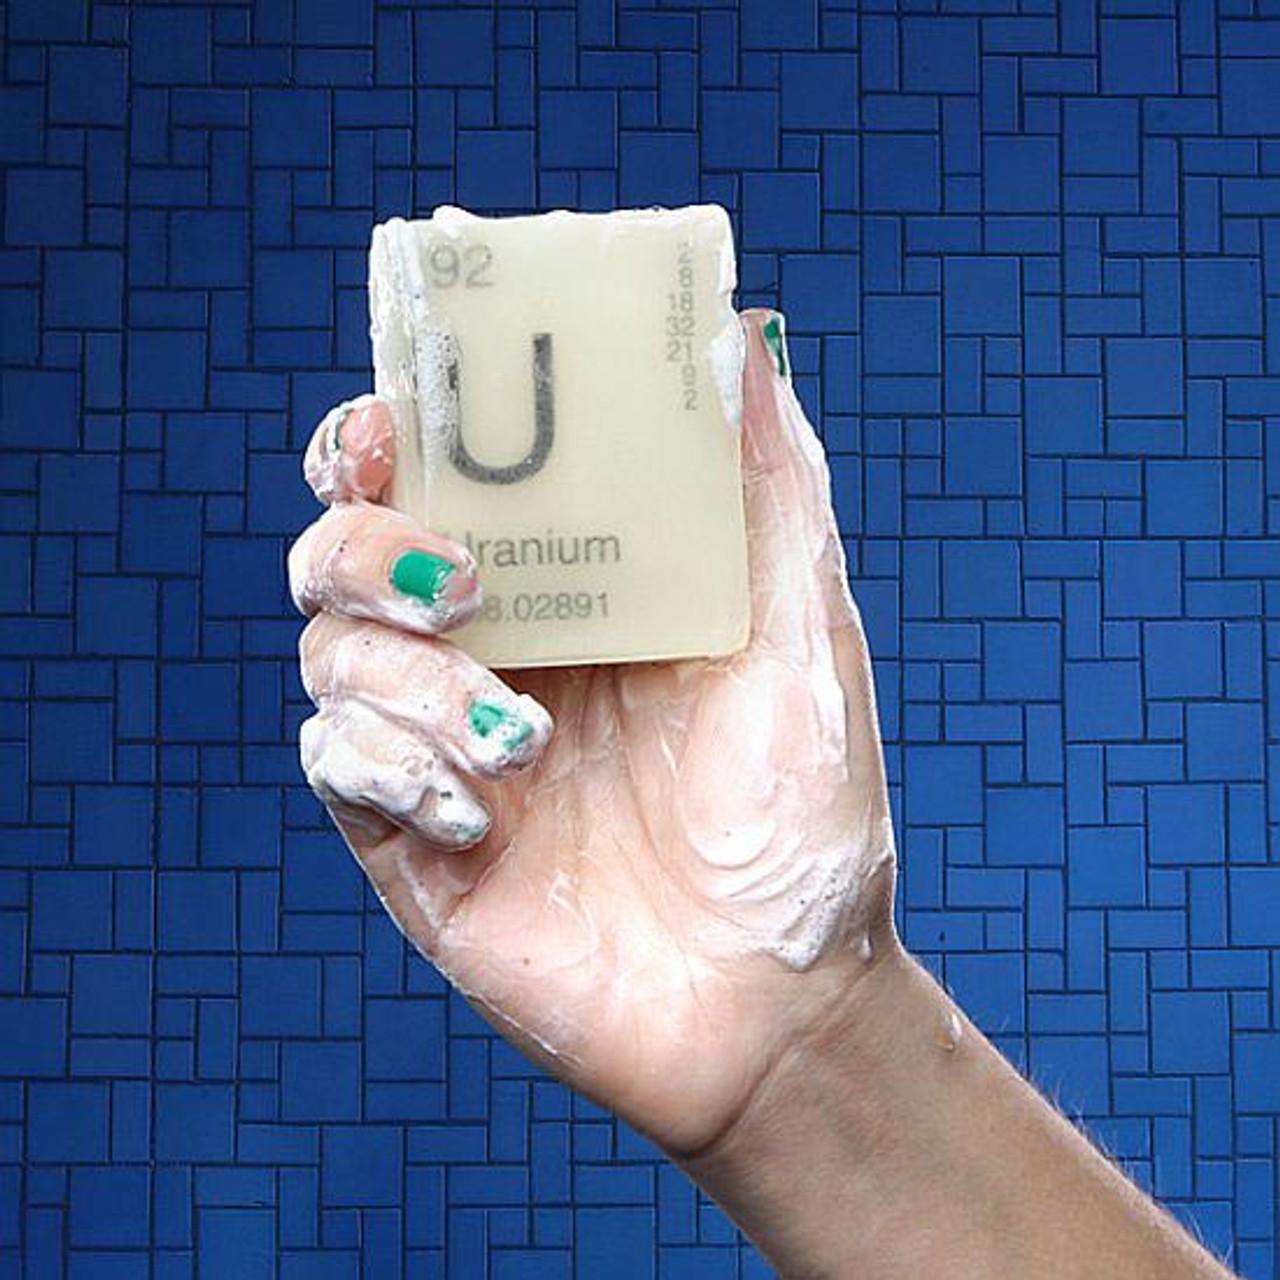 Hillary's Uranium (One) Bar of Glow In The Dark Soap